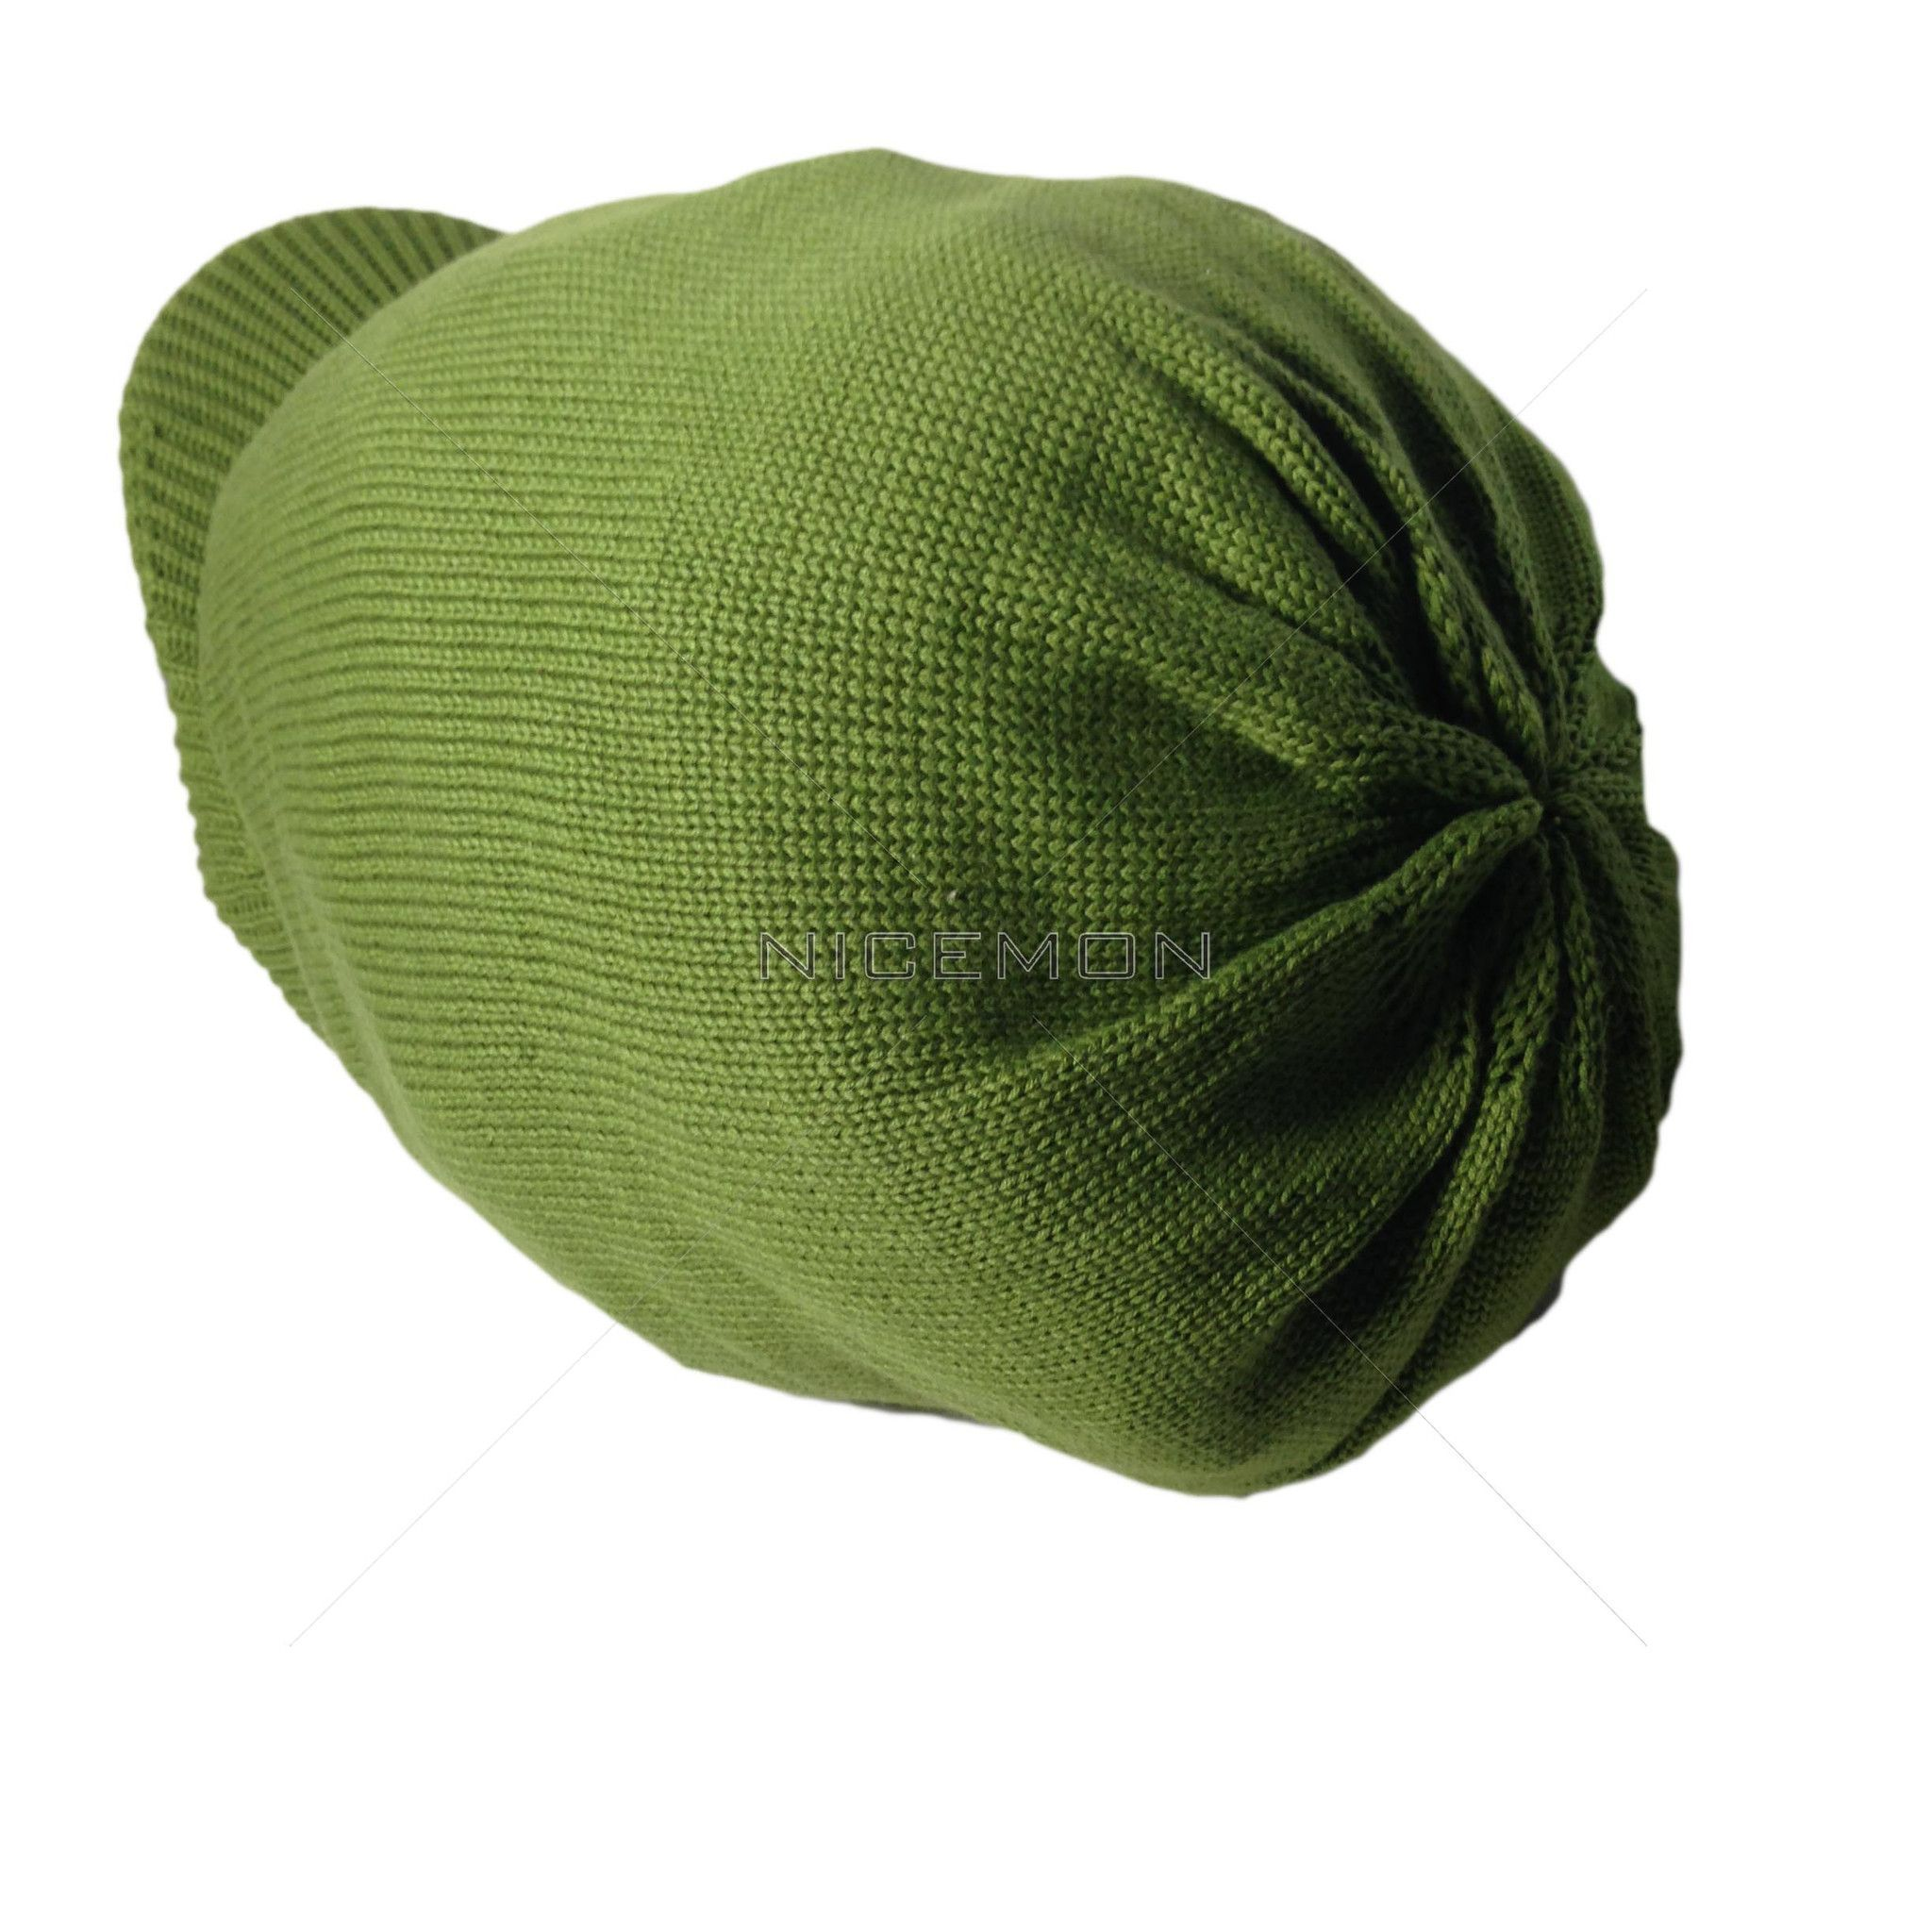 Deep Crown Rasta Peak Hat Cap Marley Jamaica Rastafari Reggae ...